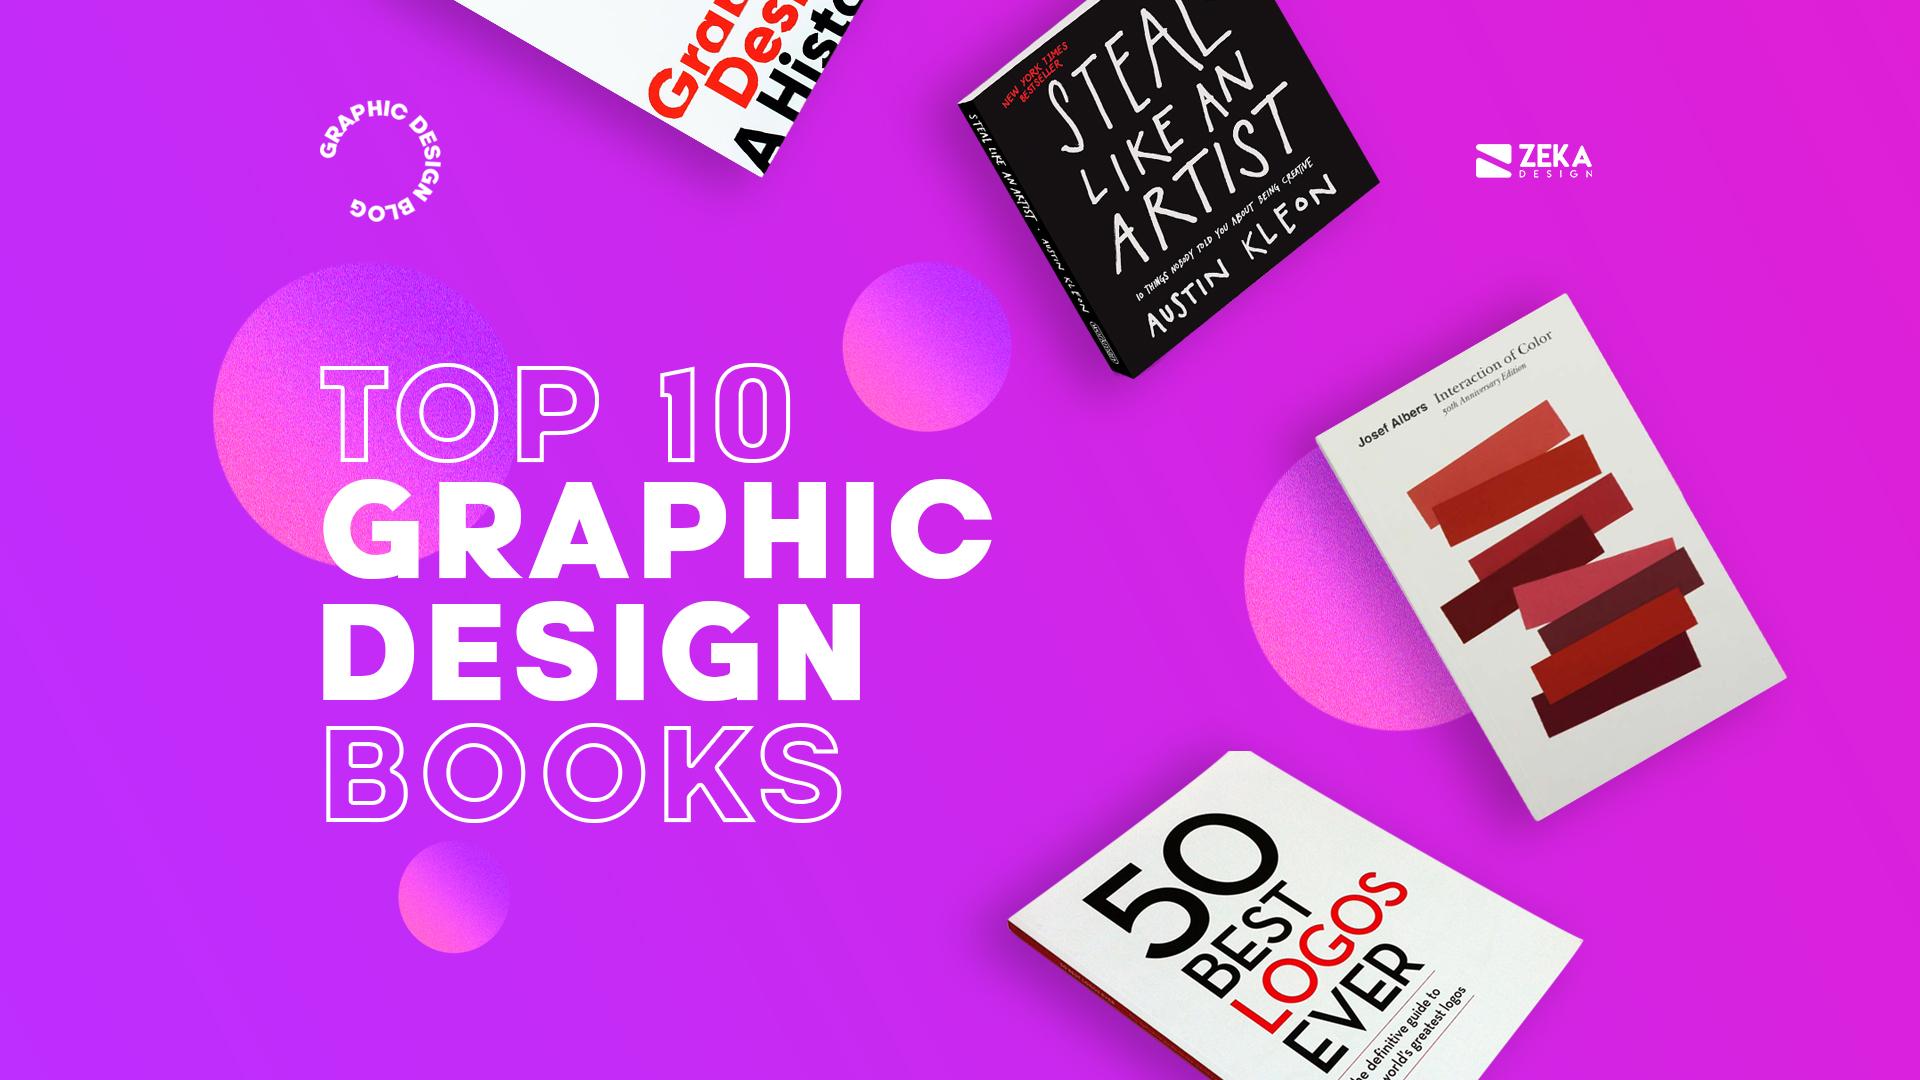 TOP 10 Graphic Design Books every graphic designer should read in 2021